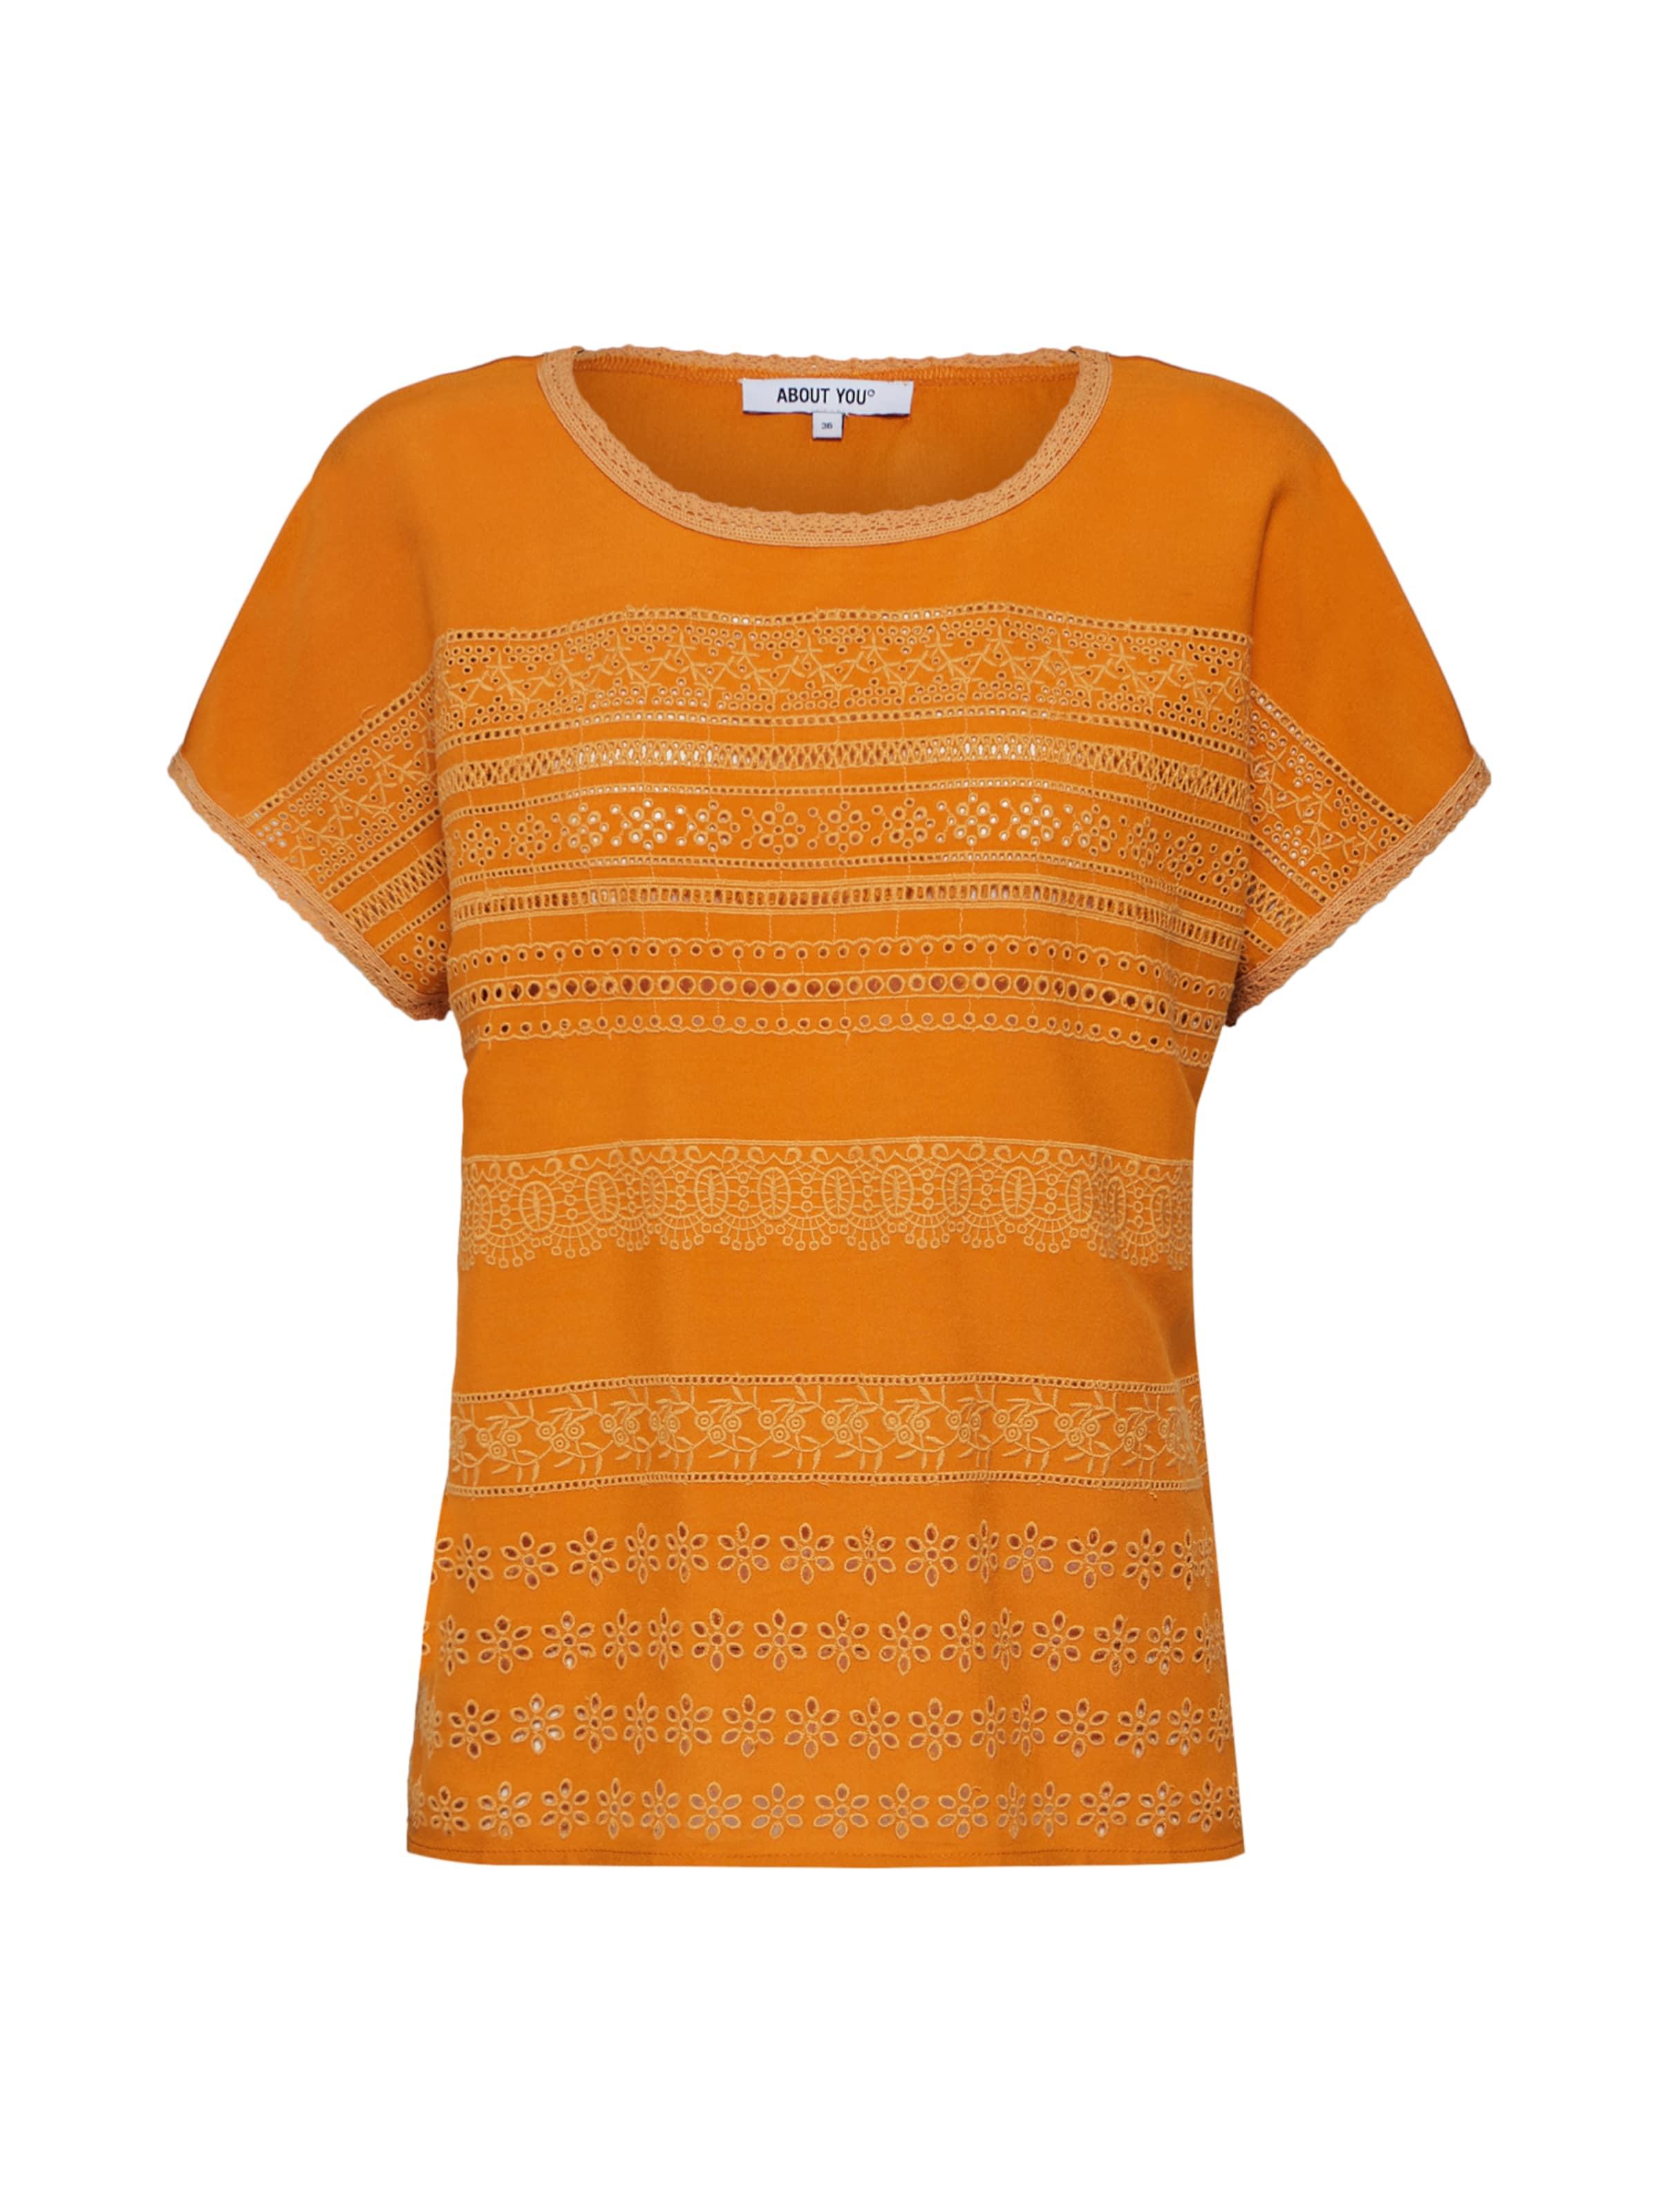 'sharon' About T You shirt Orange En Y2EWD9IH